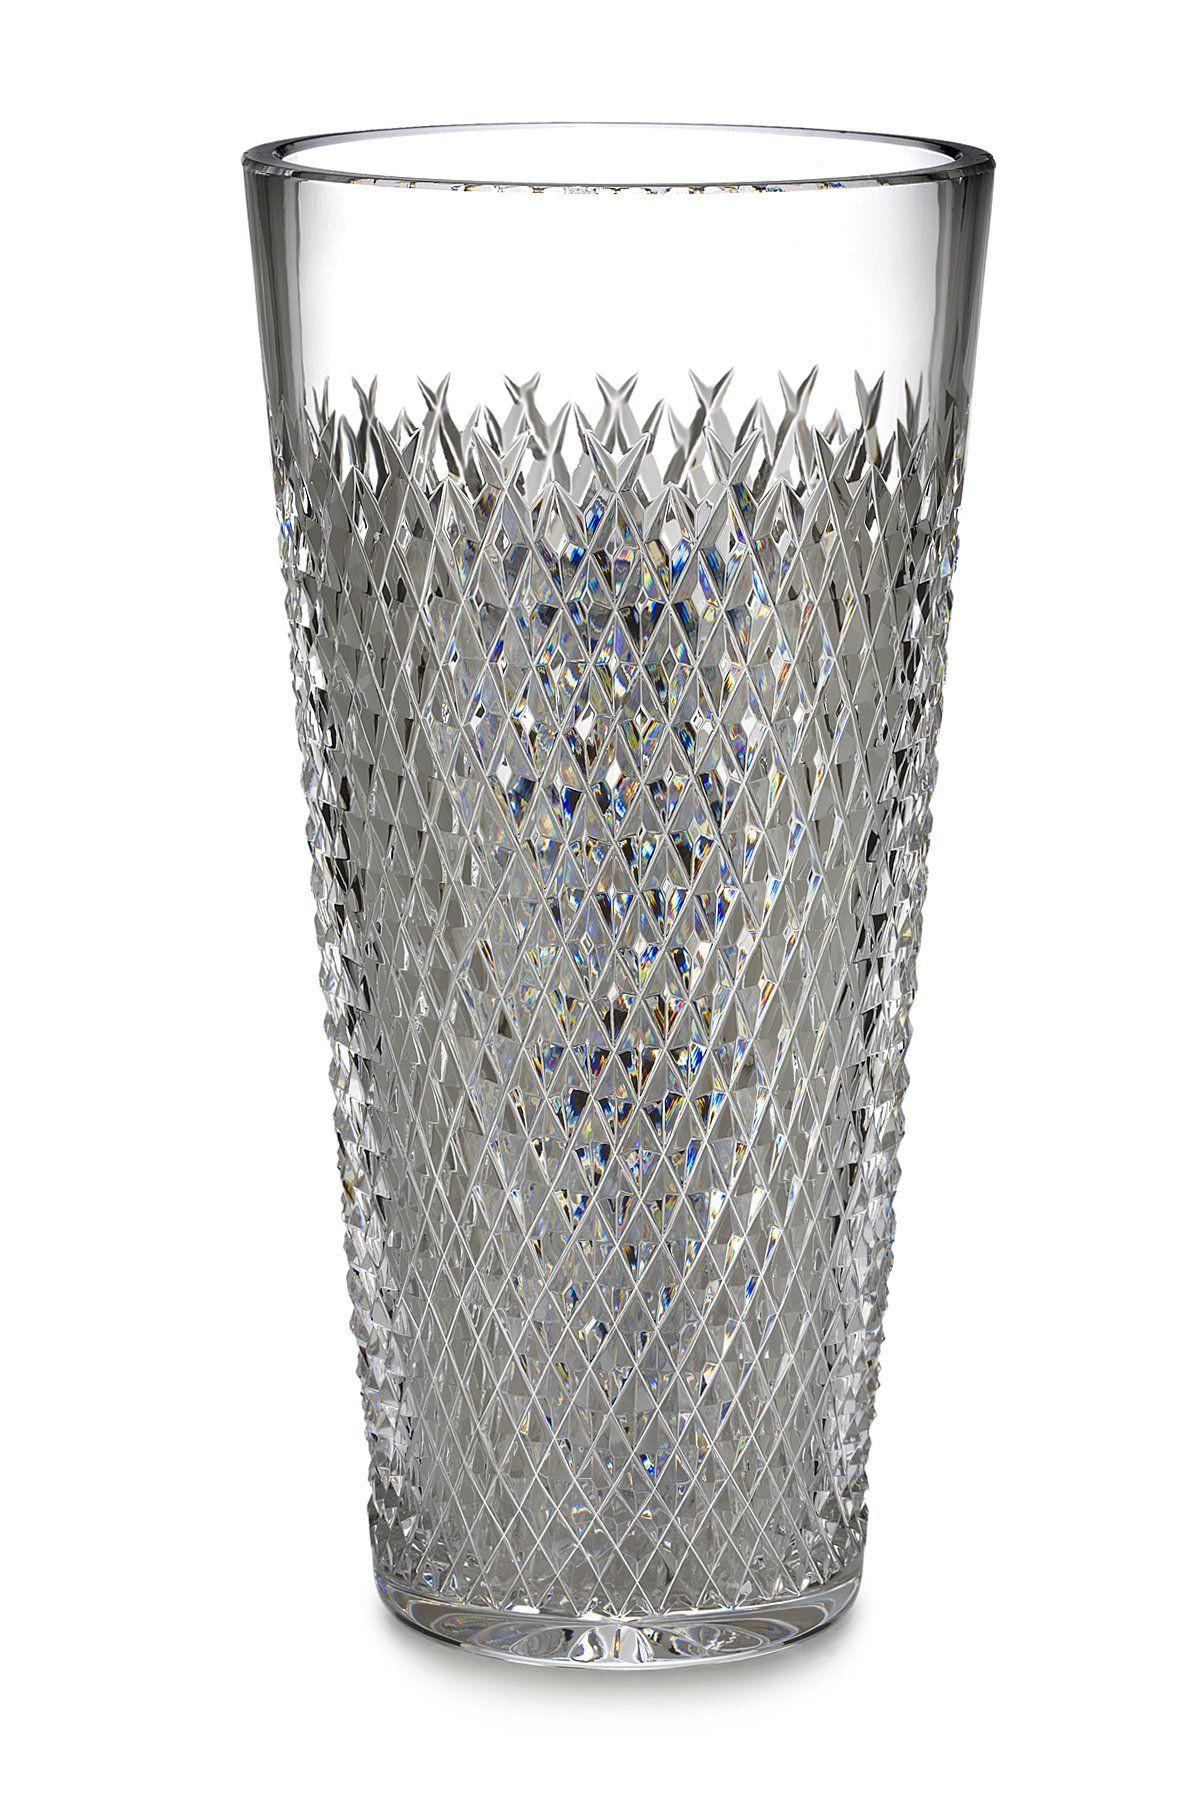 Old Waterford Crystal Vase Of Waterford Alana 12 Inch Vase 12 Inch Vase Crystal Alana Vases Throughout Waterford Alana 12 Inch Vase 12 Inch Vase Crystal Alana